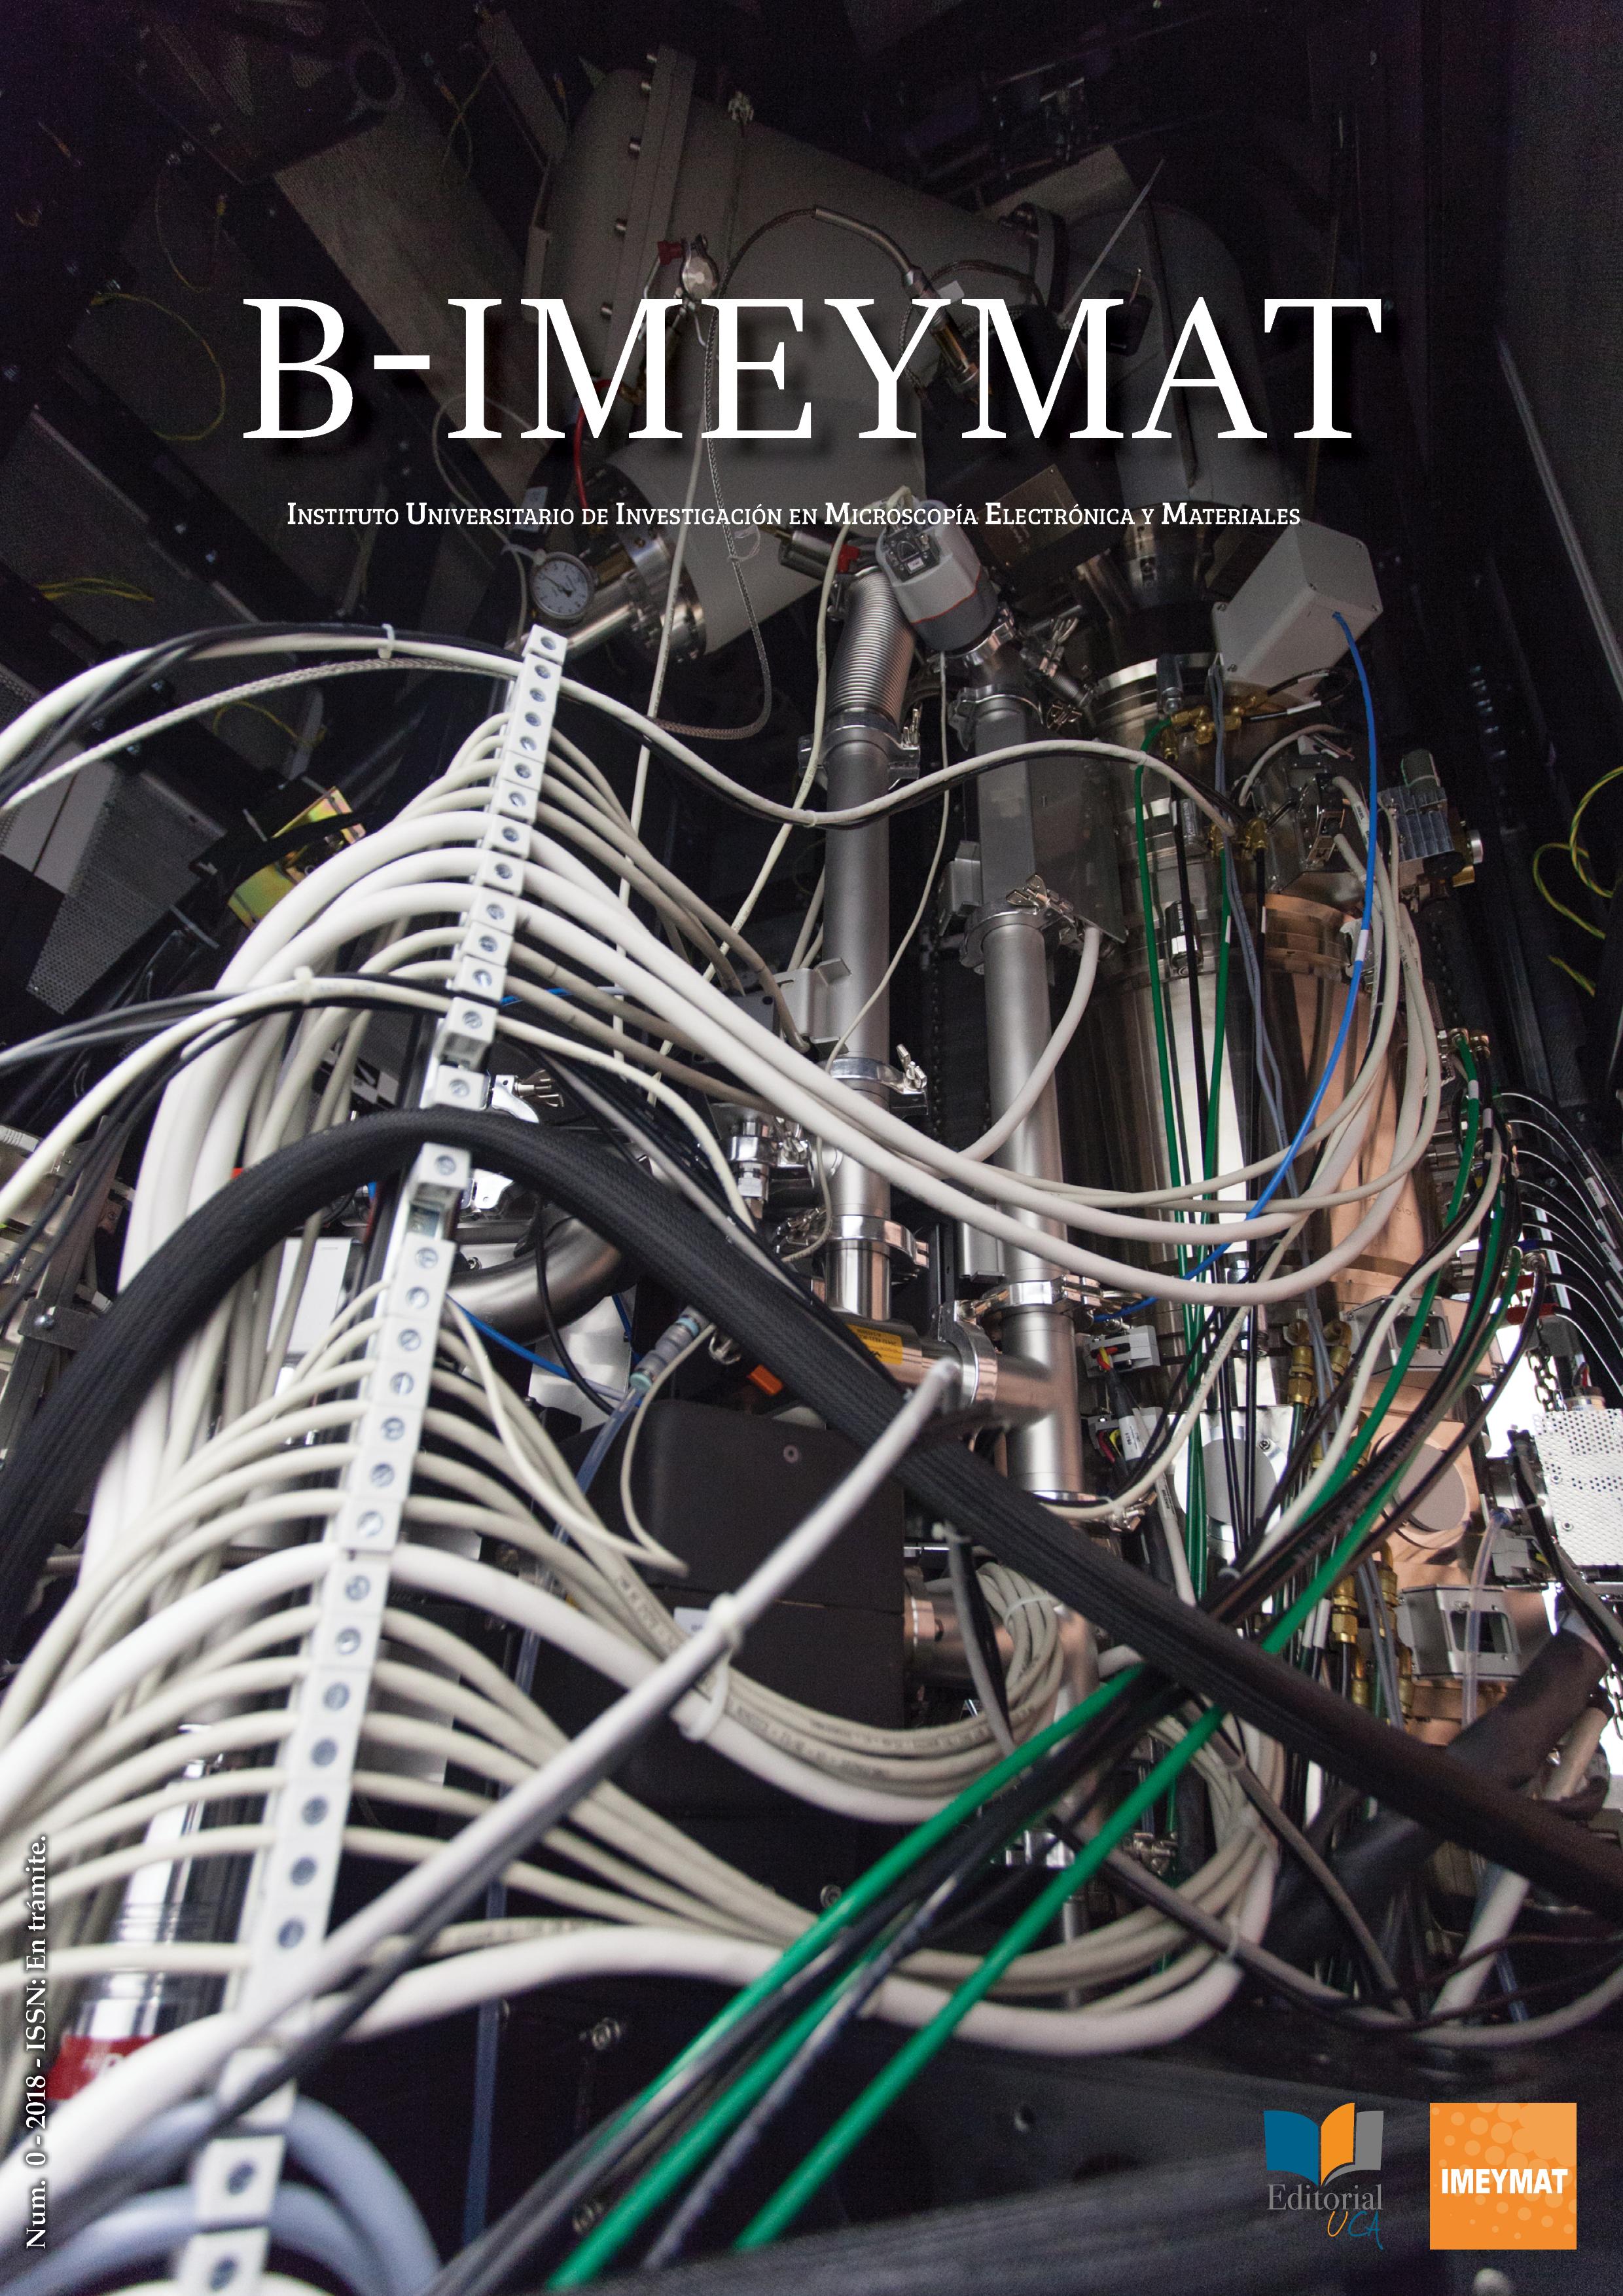 B-IMEYMAT